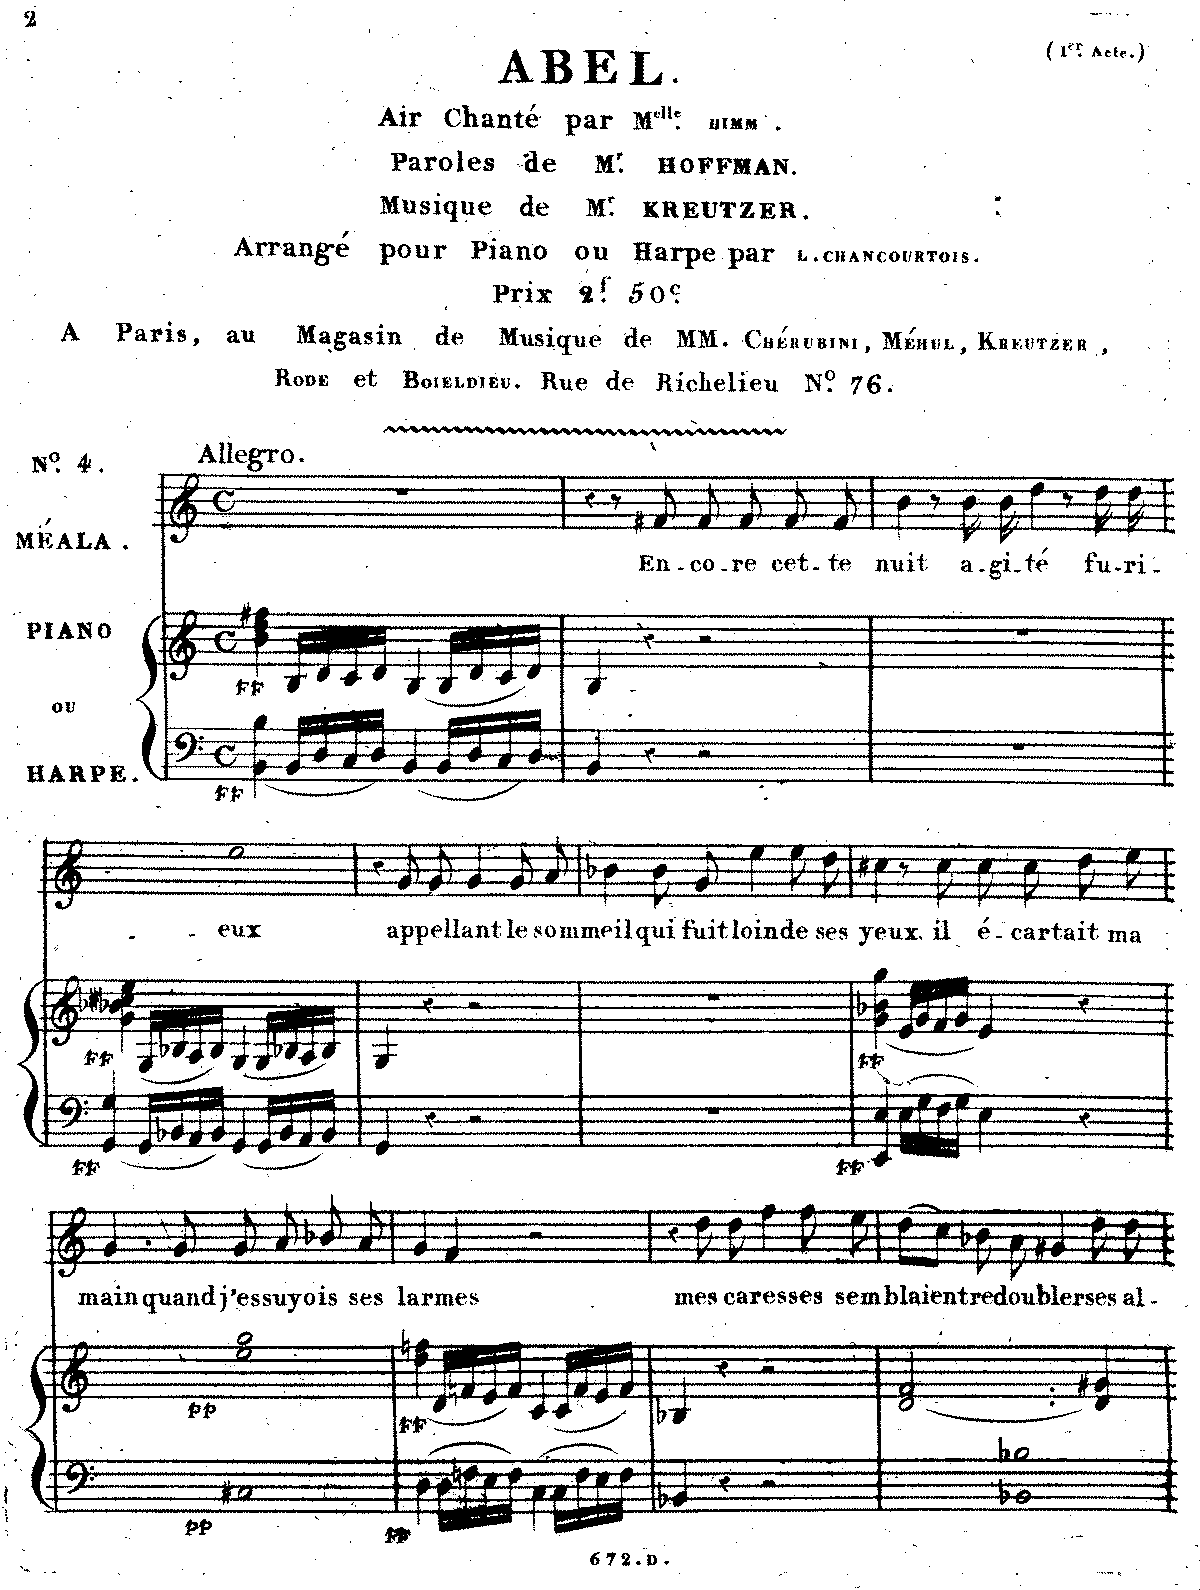 Abel (Kreutzer, Rodolphe) - IMSLP/Petrucci Music Library: Free